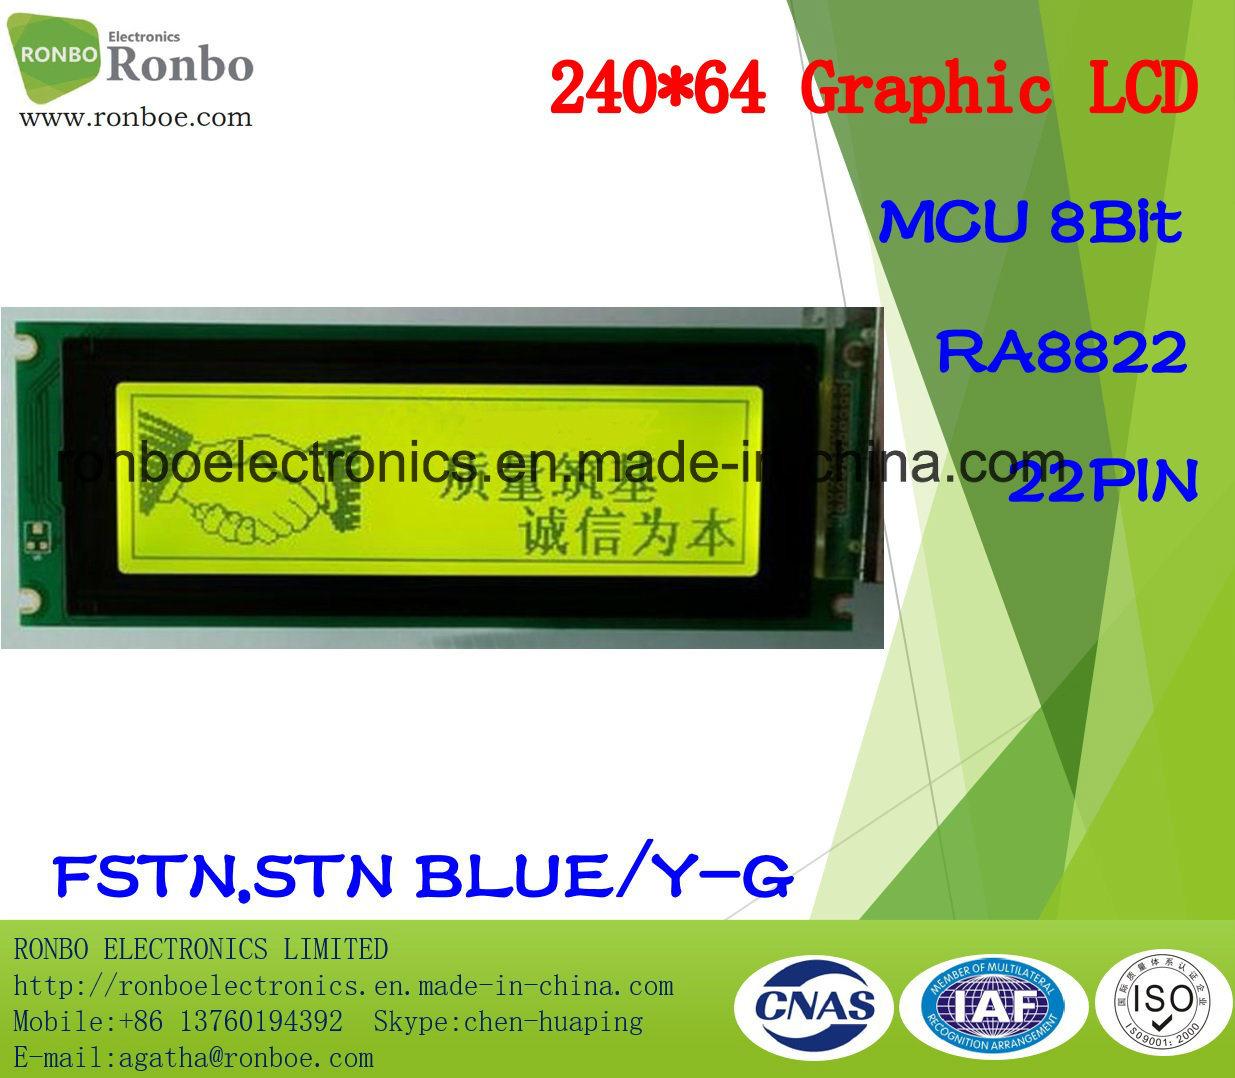 240X64 Graphic LCD Panel, MCU 8bit, Ra8822, 22pin, COB FSTN LCD Module